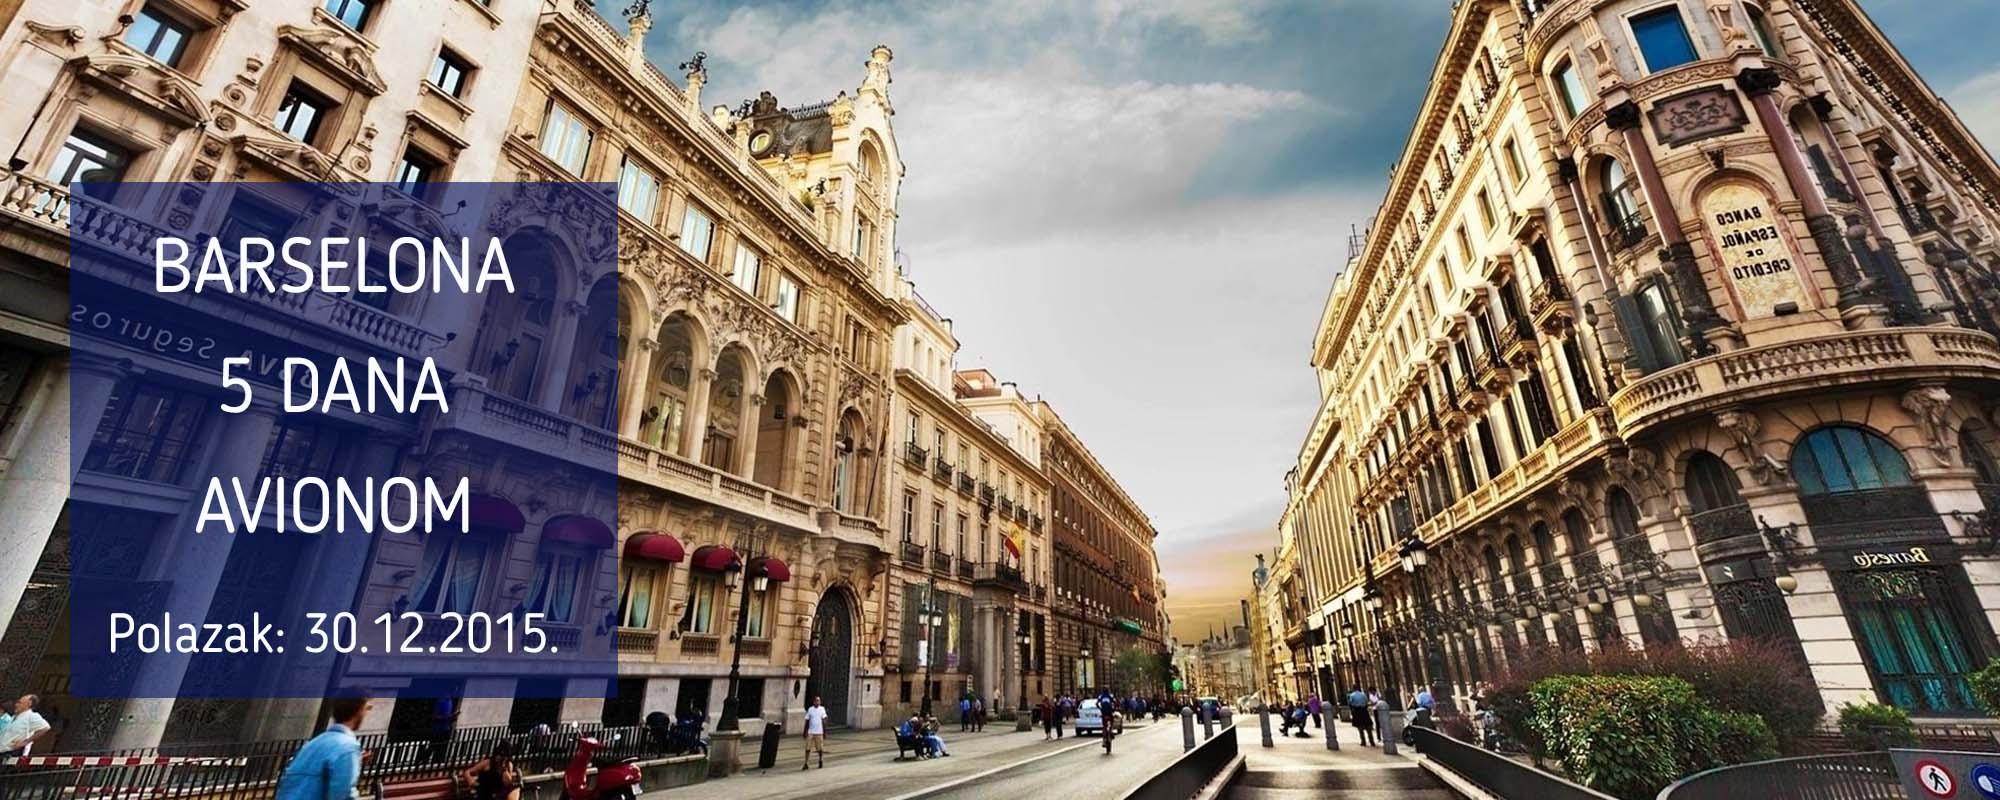 Barselon